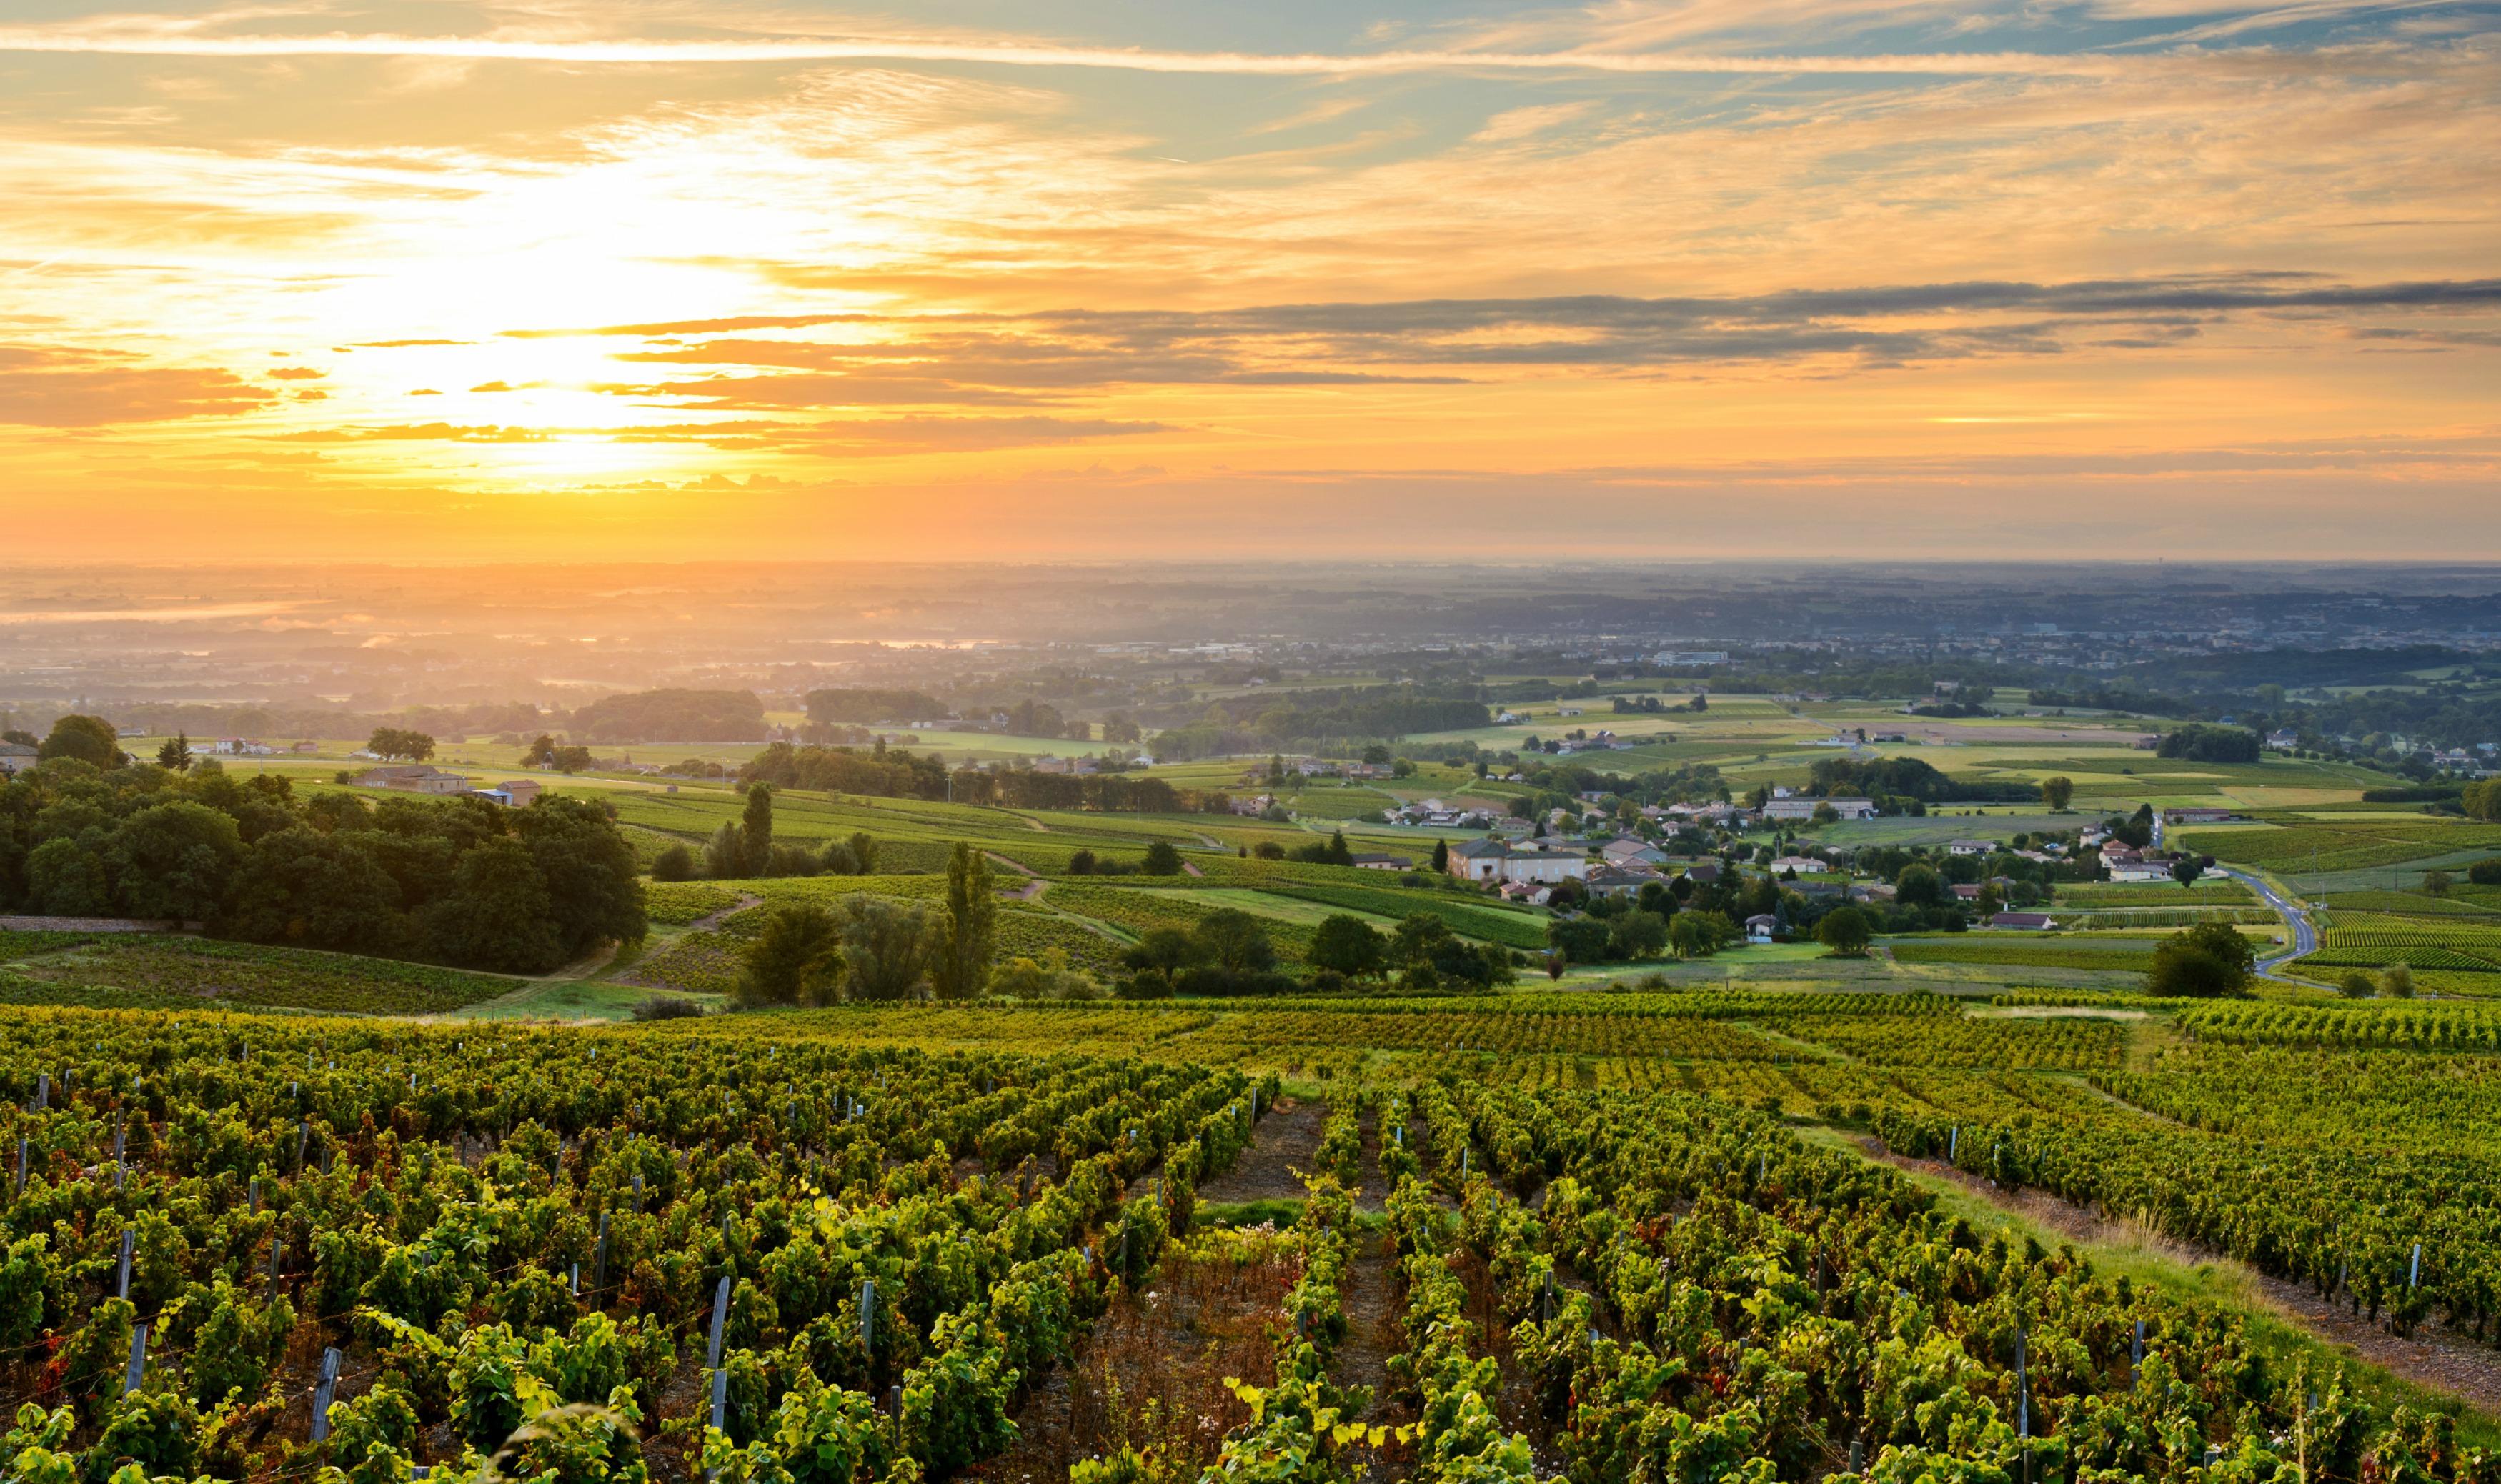 Sunset at Beaujolais Valley